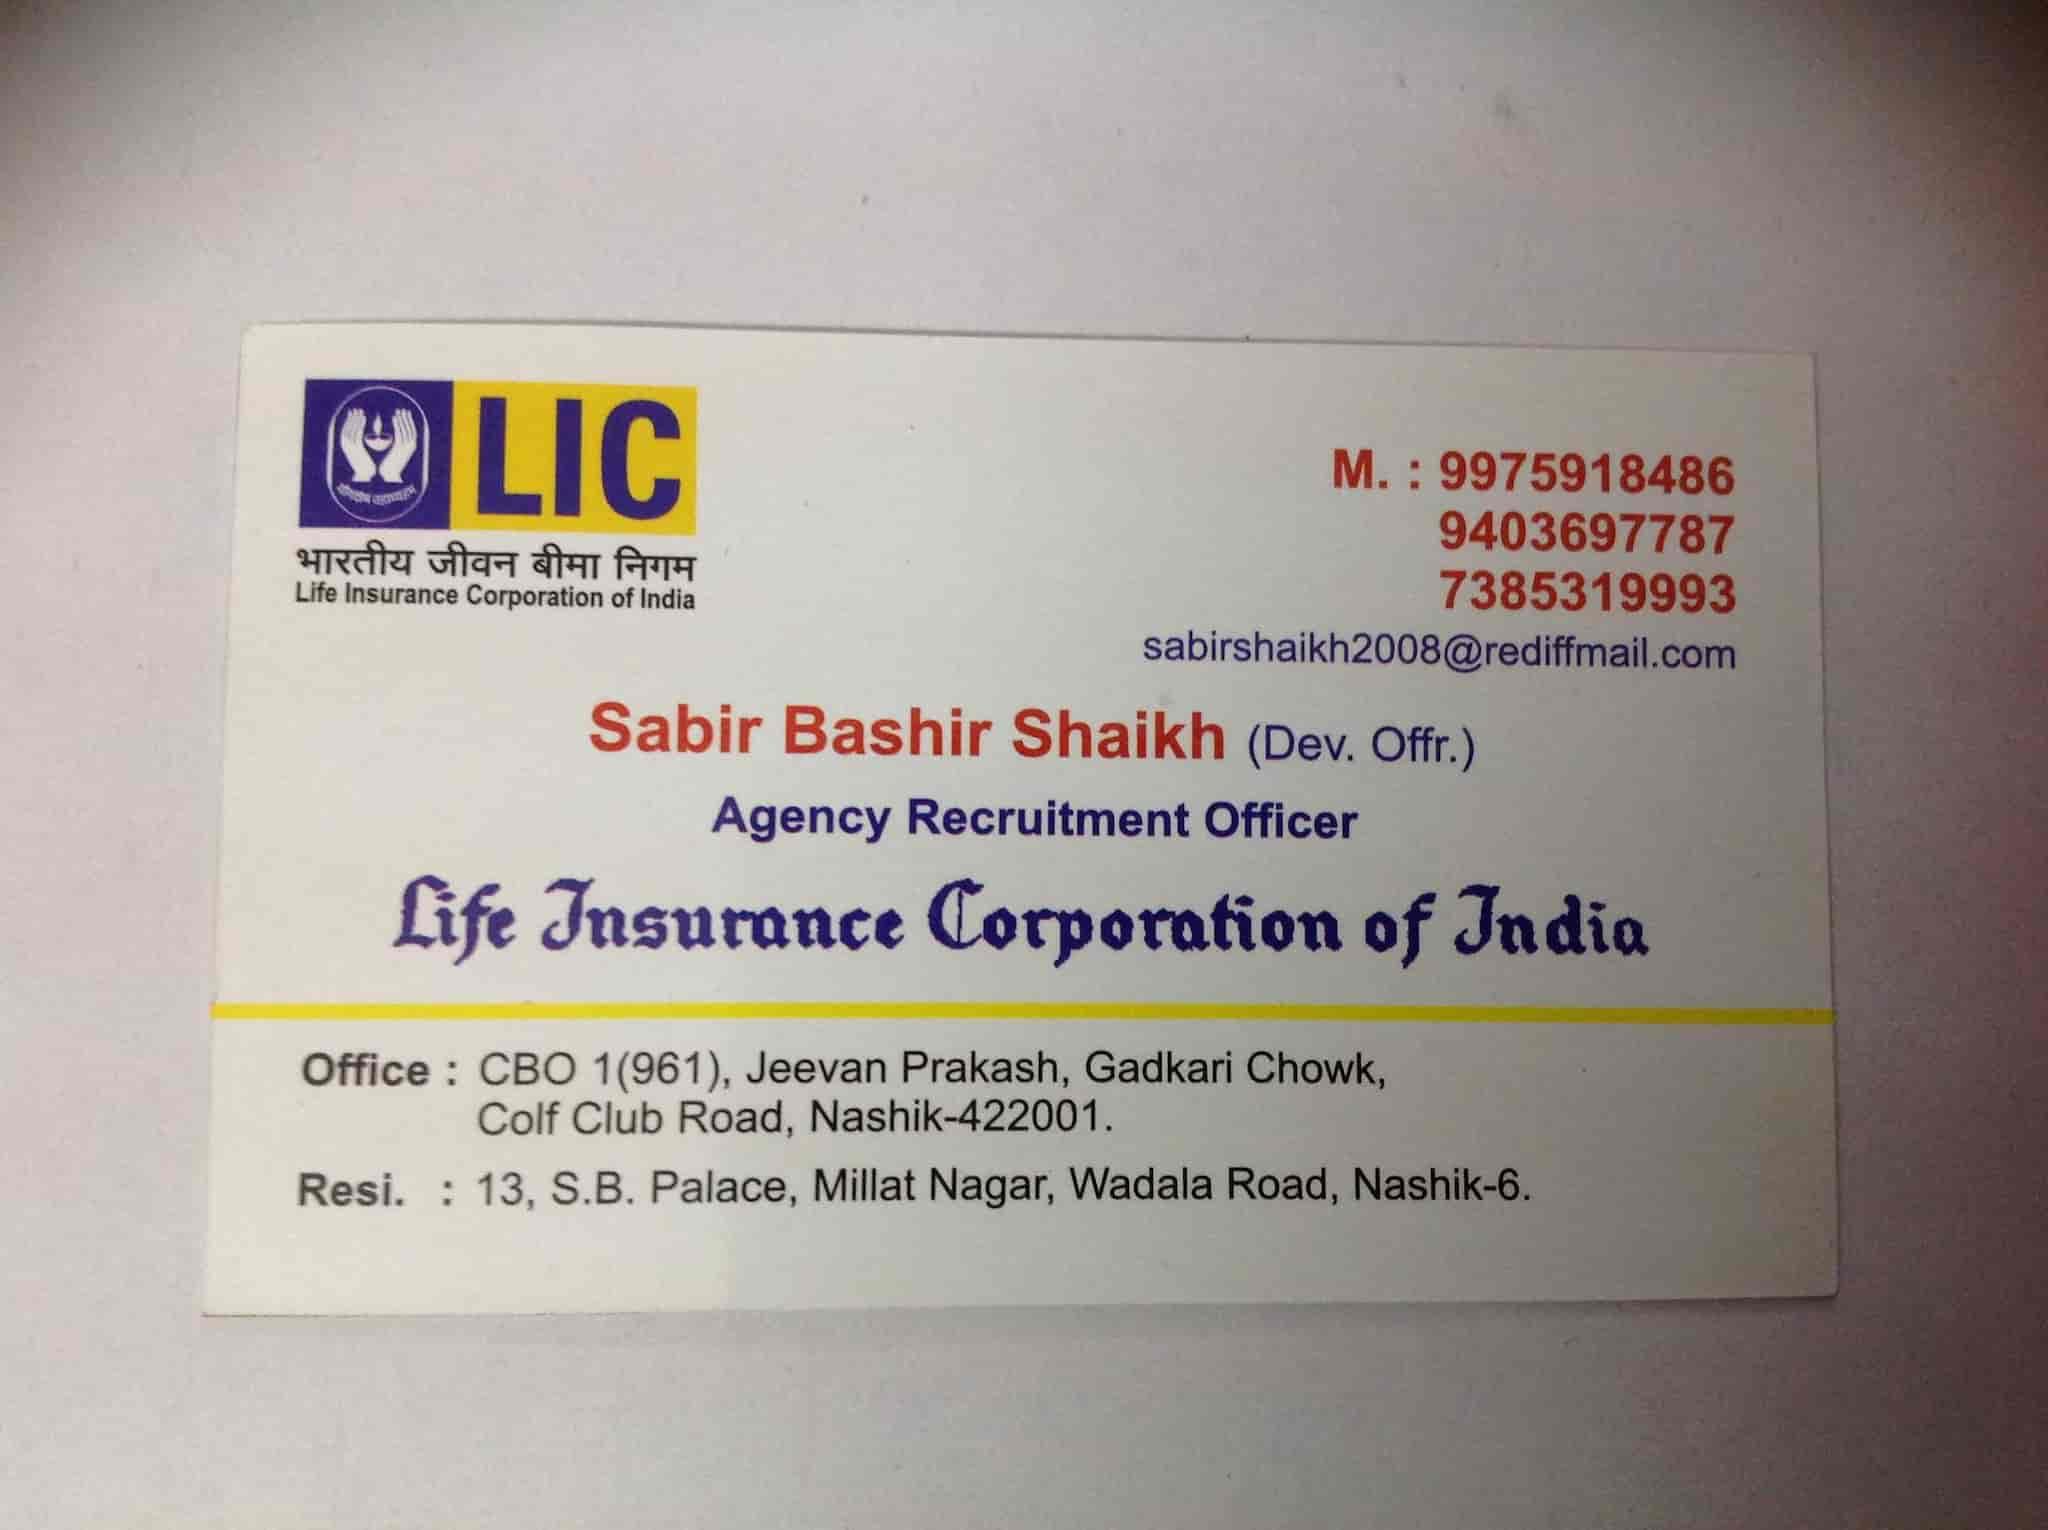 Lic of india agency recruitment photos wadala road nashik visiting card lic of india agency recruitment photos wadala road nashik placement colourmoves